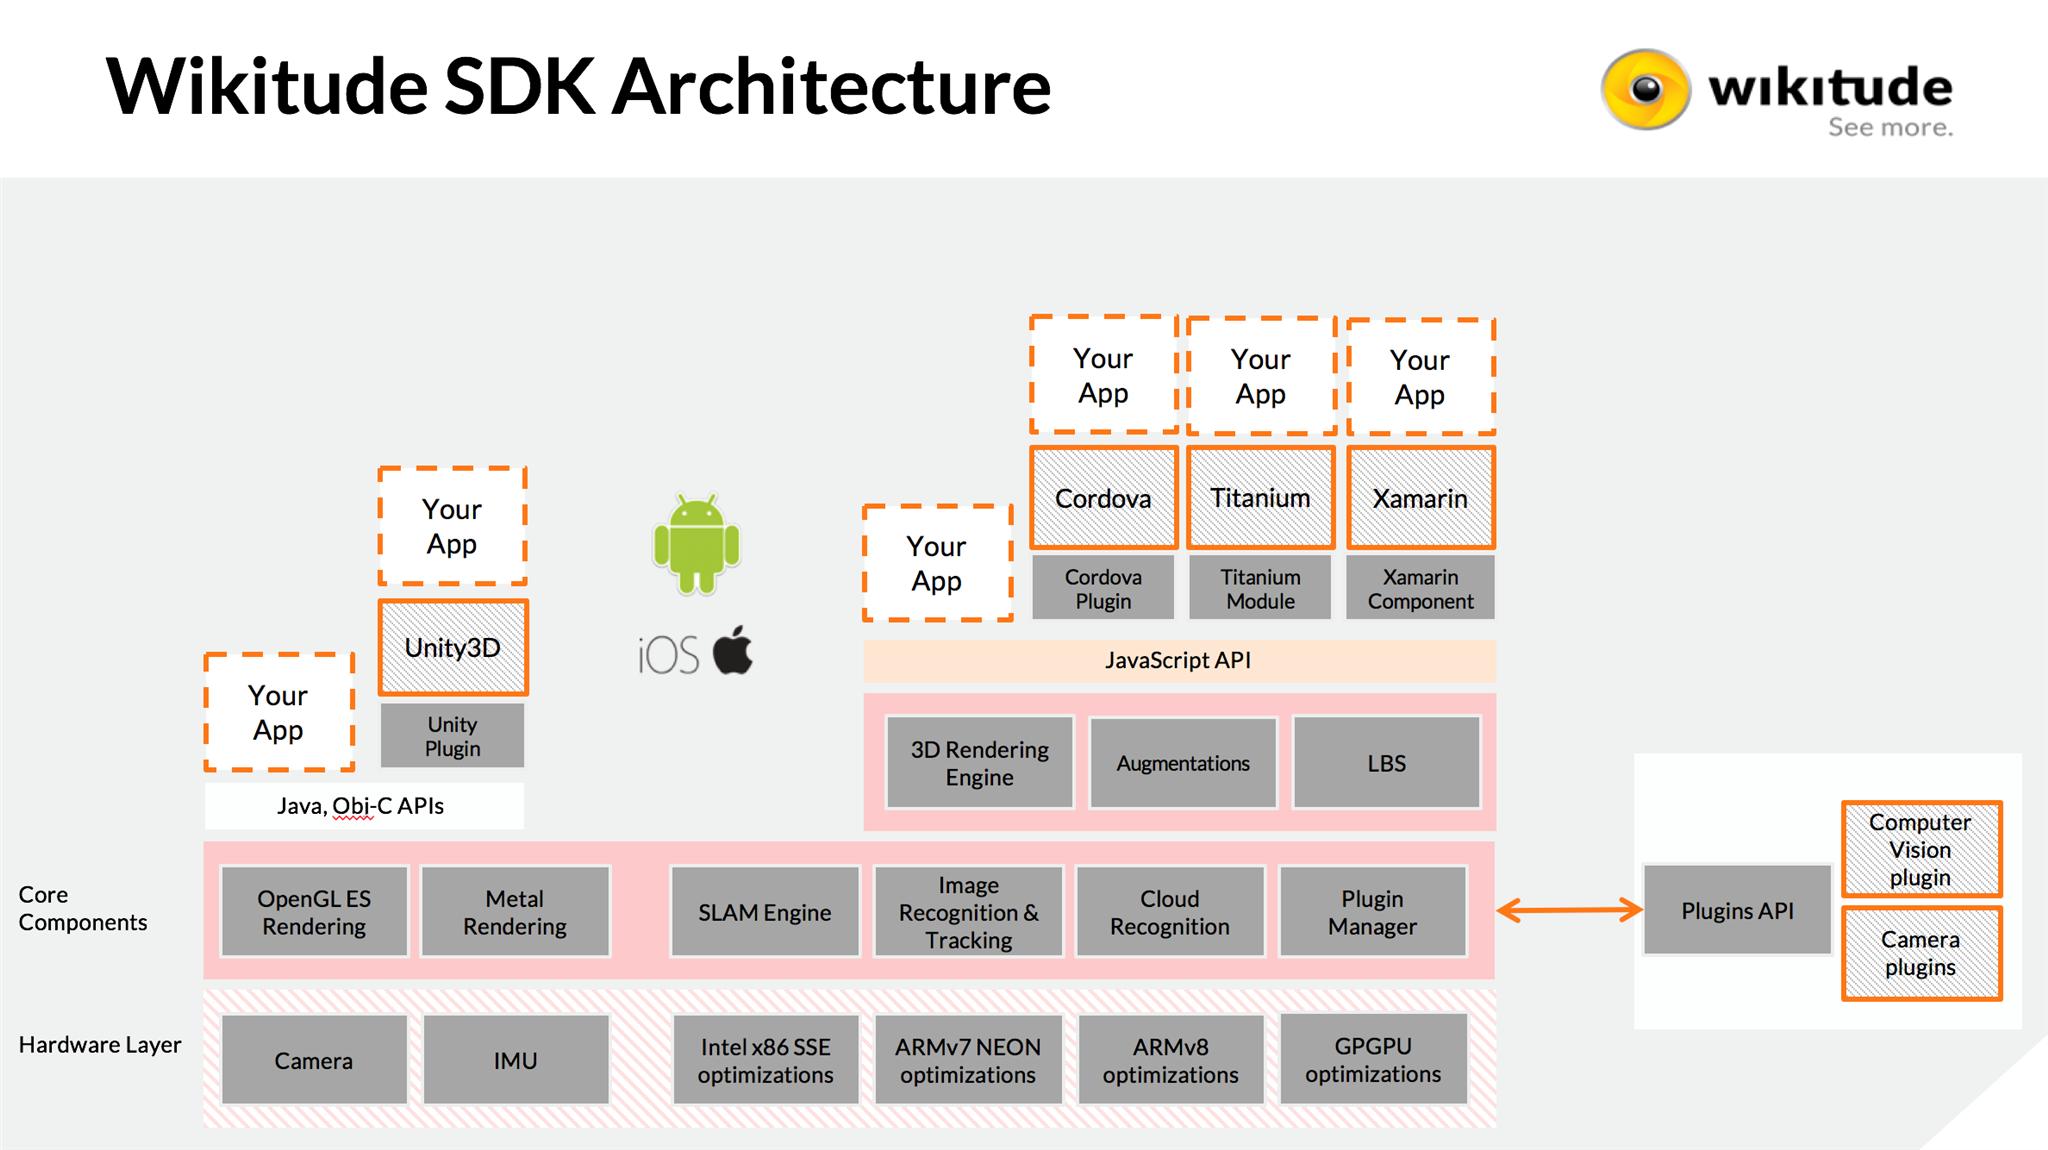 sdk7 architecture